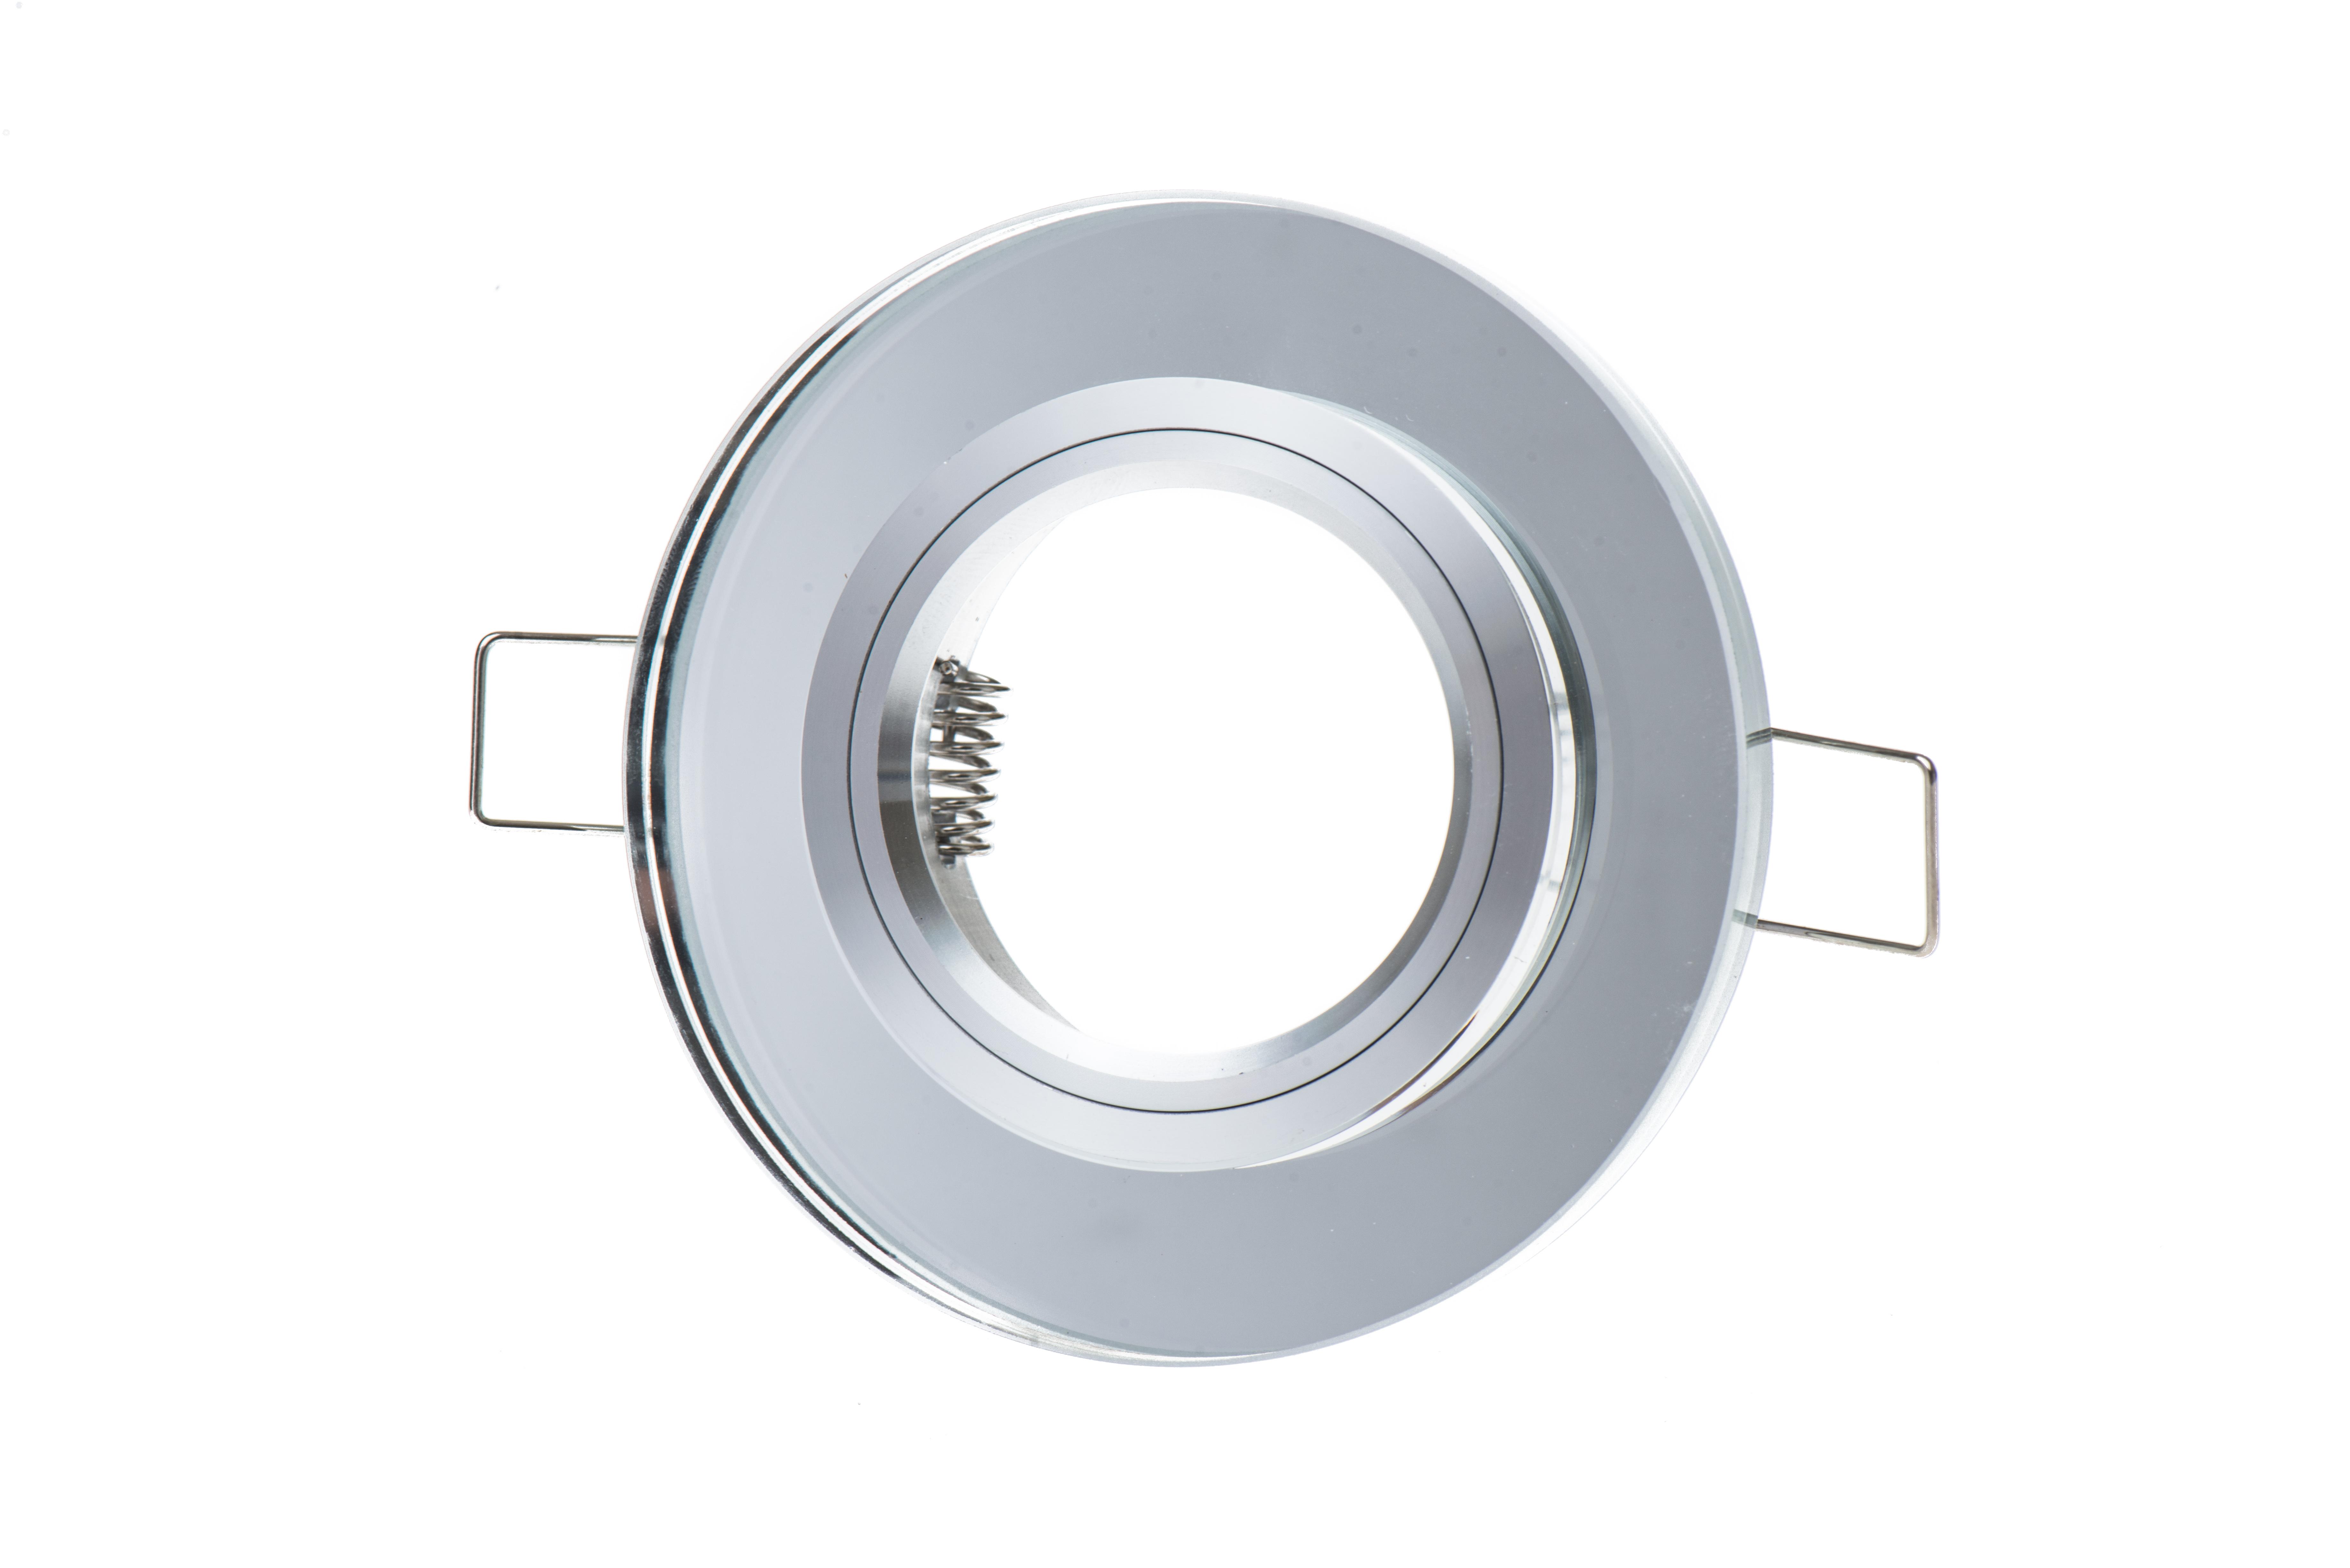 Halogen Leuchte, LED, Treppe, Einbaustrahler RES-7002 Crystal + ...